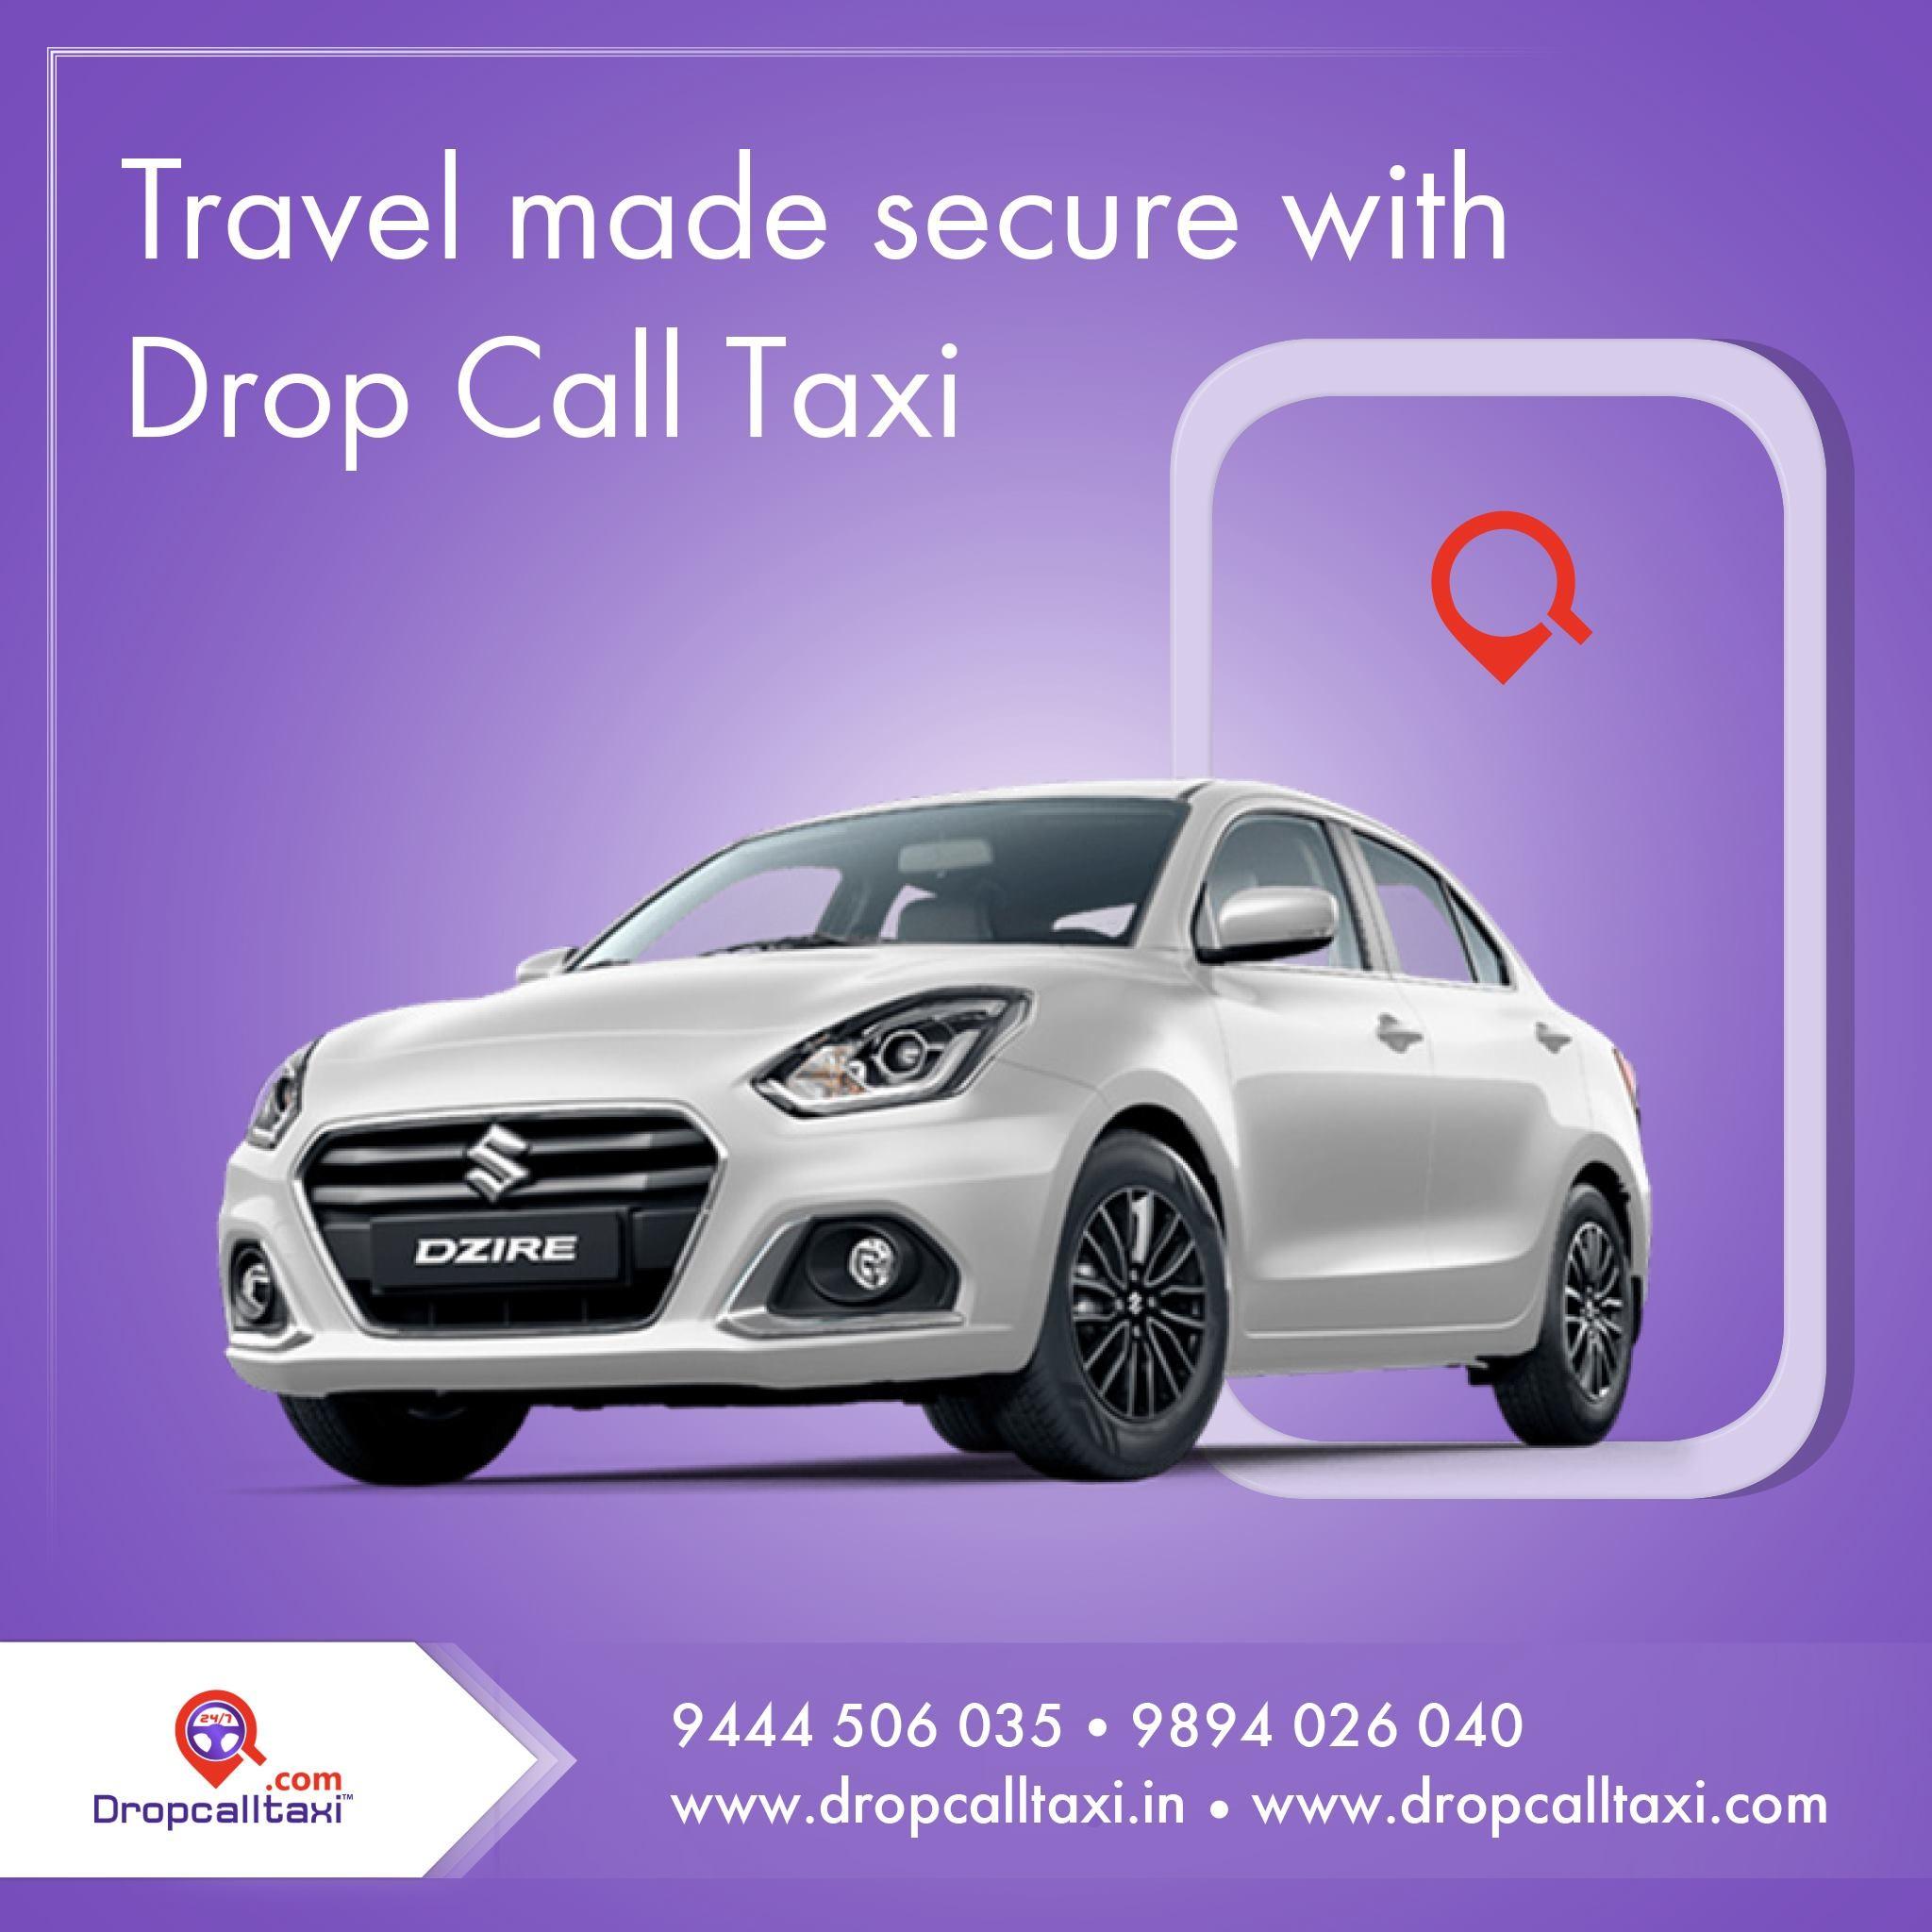 Drop Call Taxi